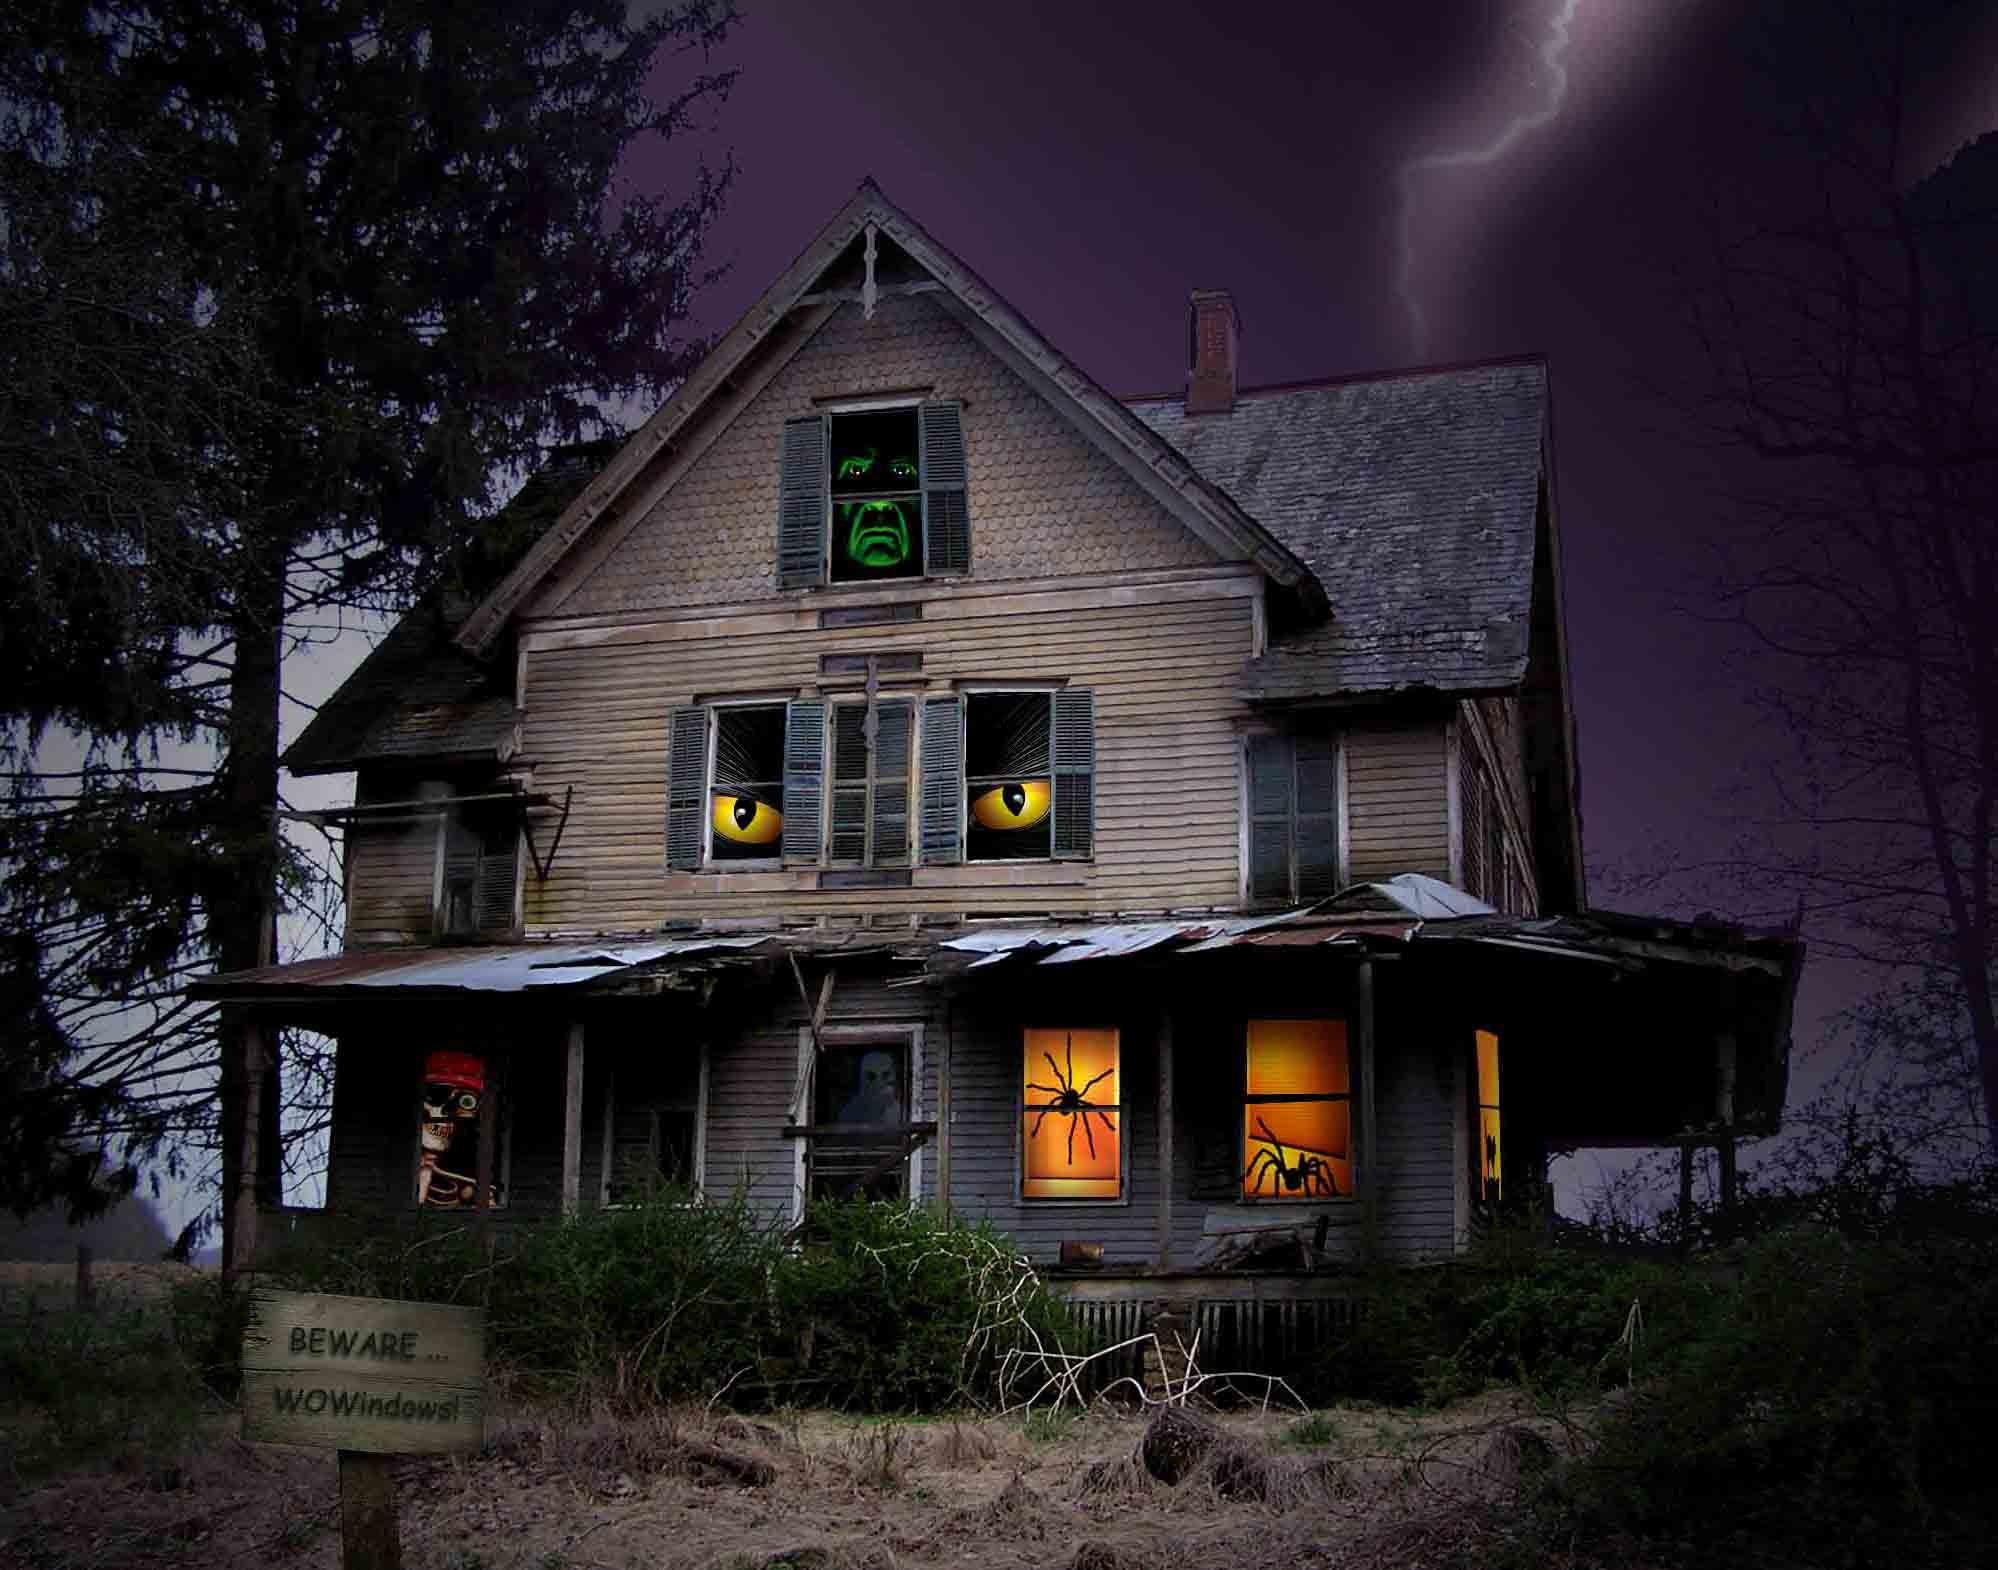 Scary Halloween Pumpkin 2012 Haunted House HD Wallpaper